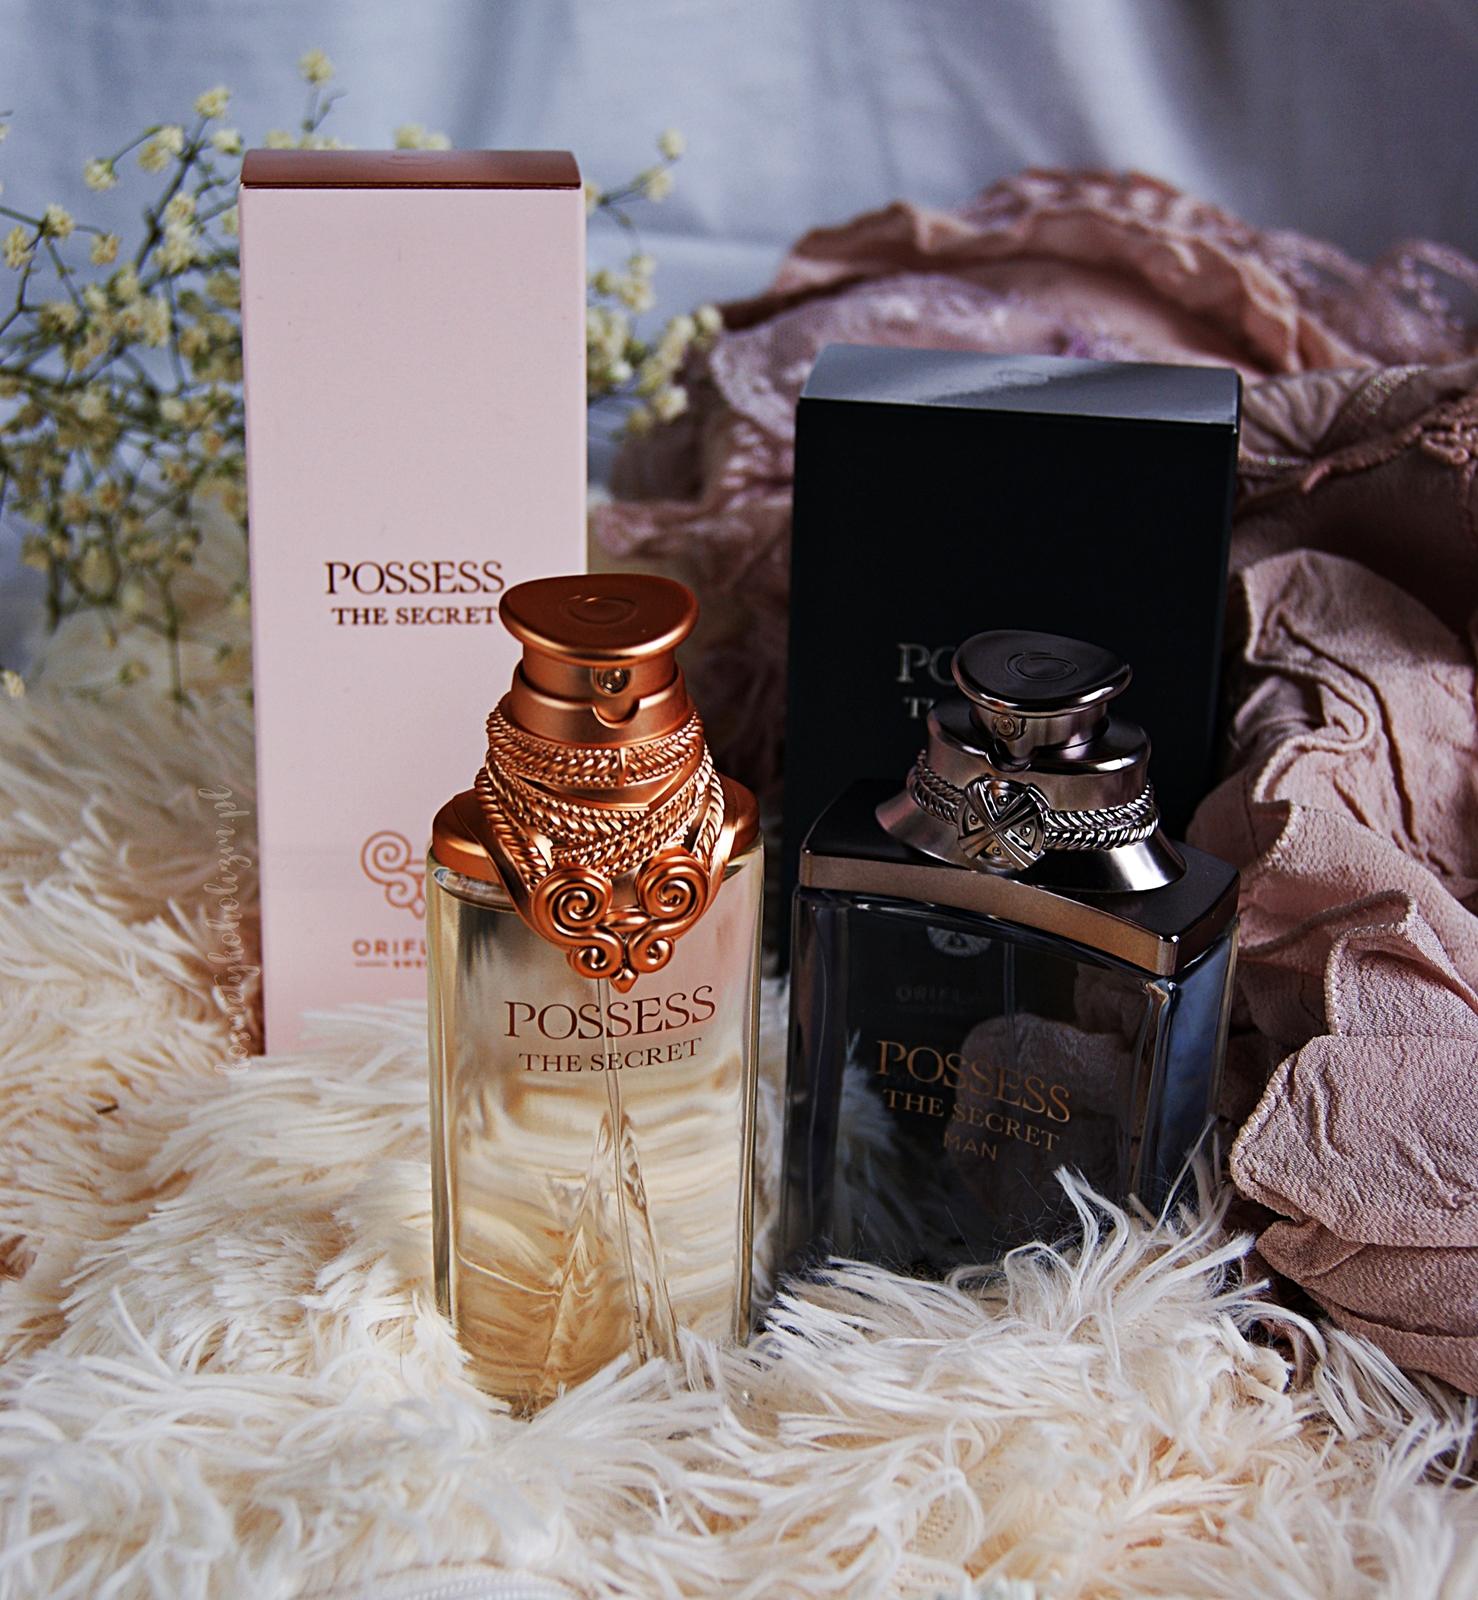 Oriflame POSSESS The Secret | Zapachy inspirowane nordyckimi bogami